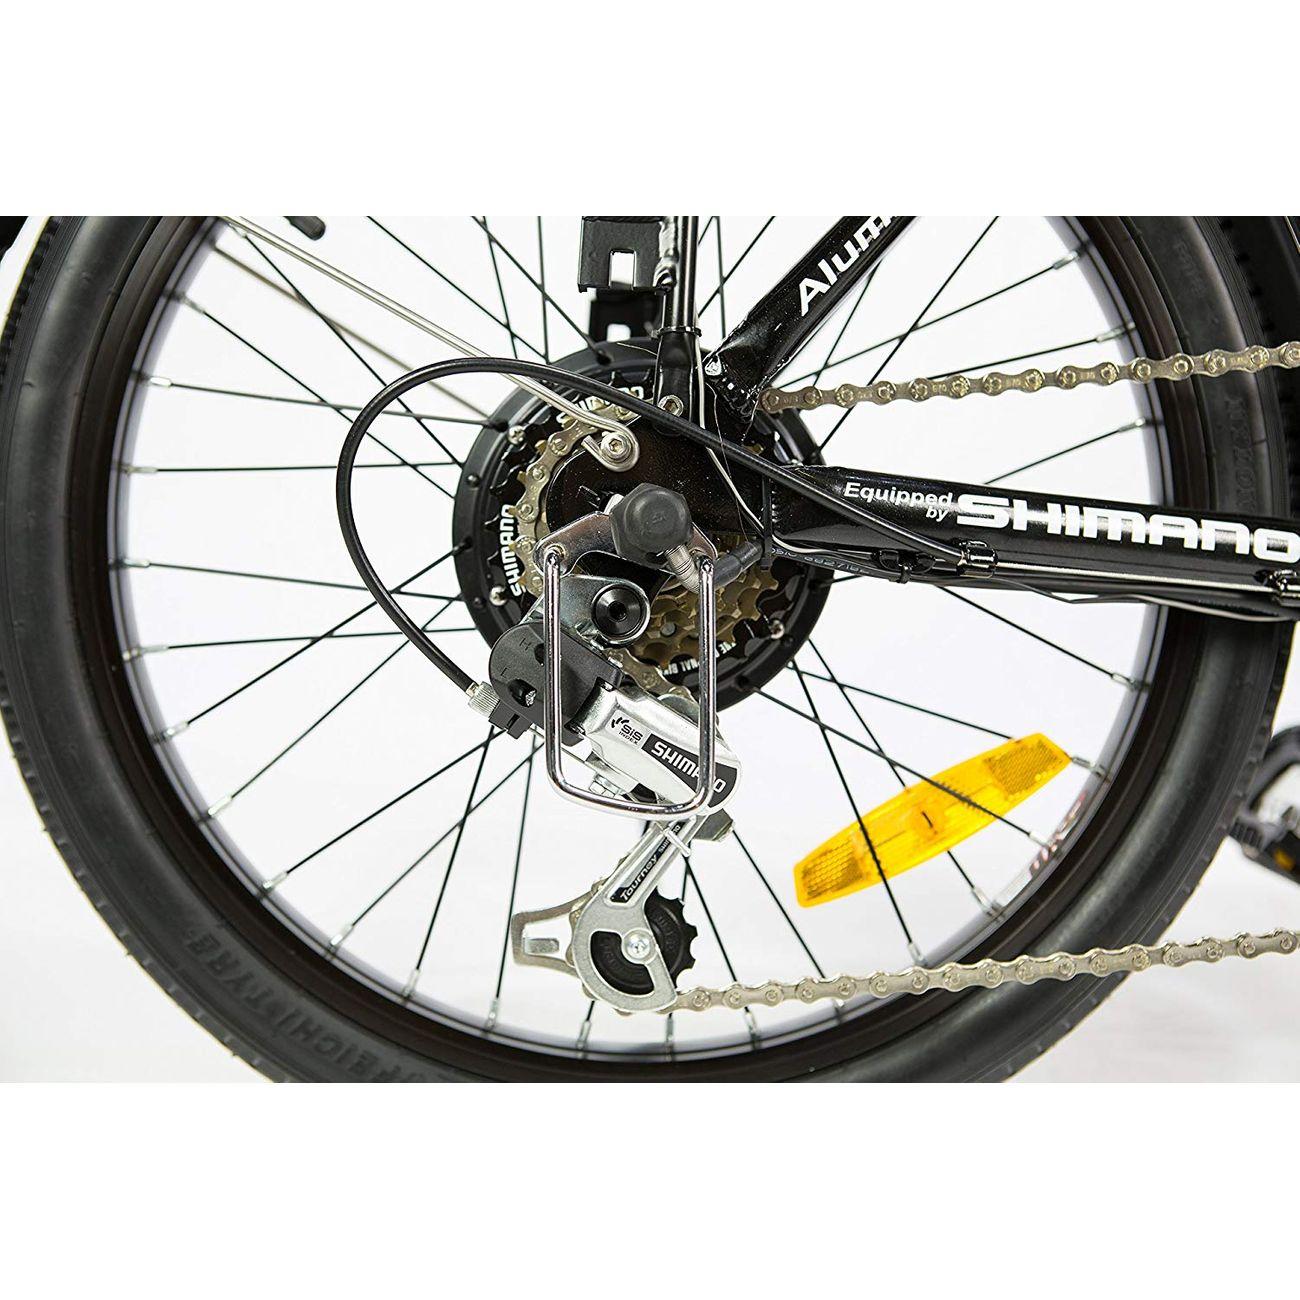 MOMABIKES Moma Bikes Vélo Electrique VAE Pliant De ville, E-20.2